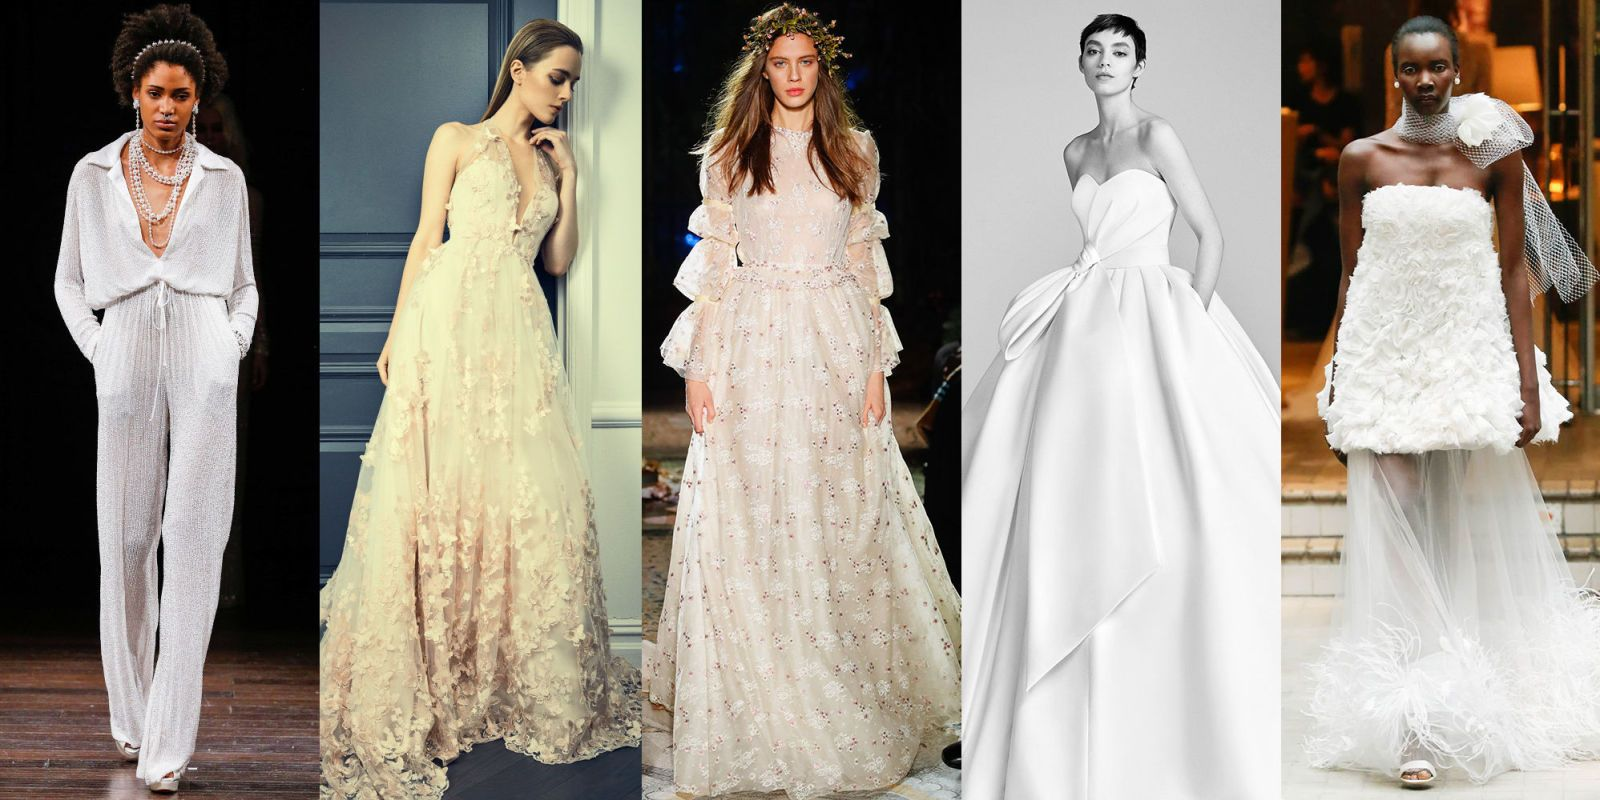 White dress fashion trend 2018